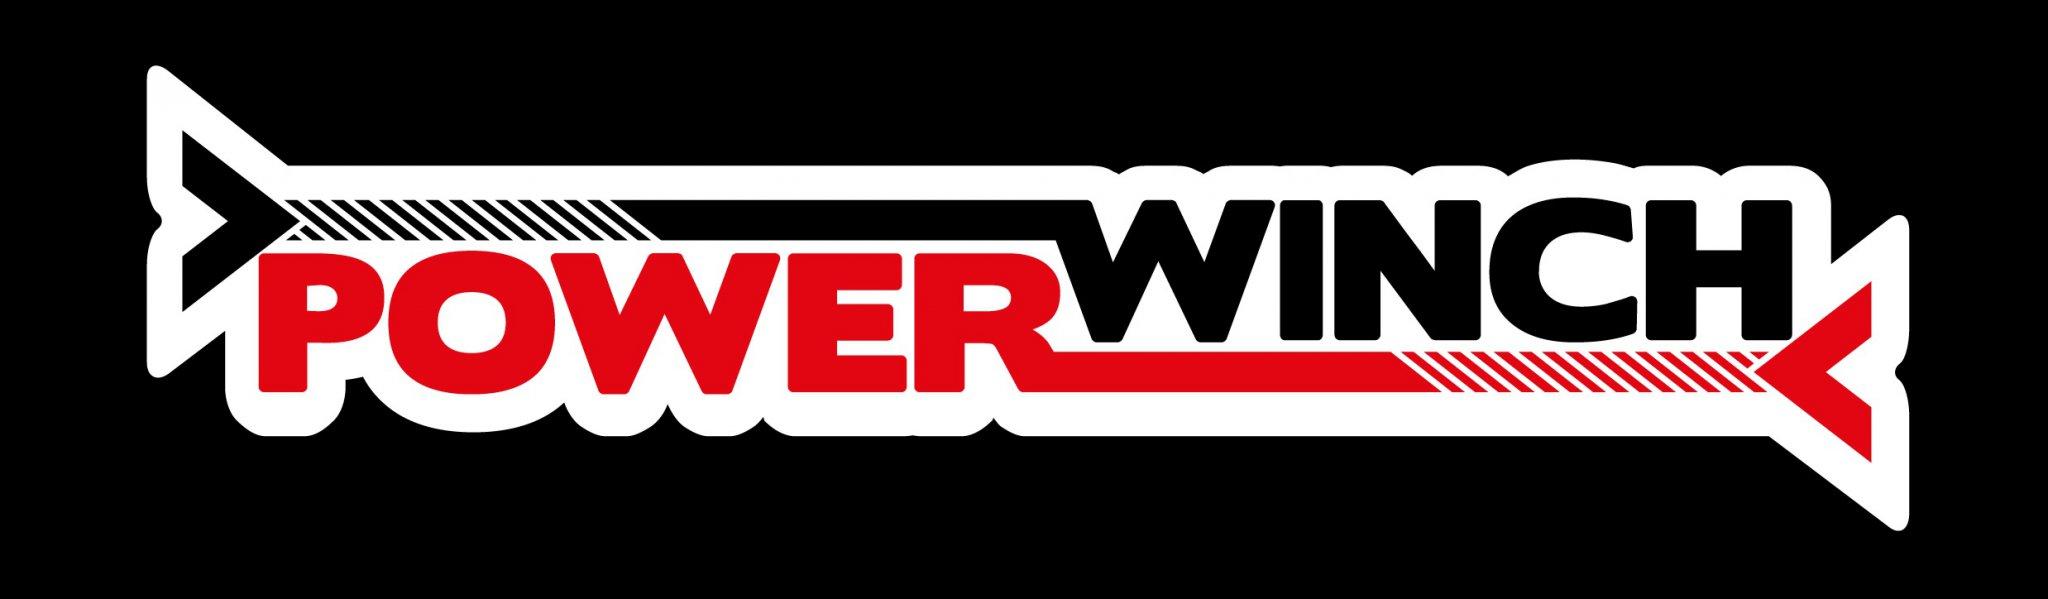 Име:  LOGO-power-winch-RGB-na-ciemnym.jpg Прегледи: 492 Размер:  87.3 Кб